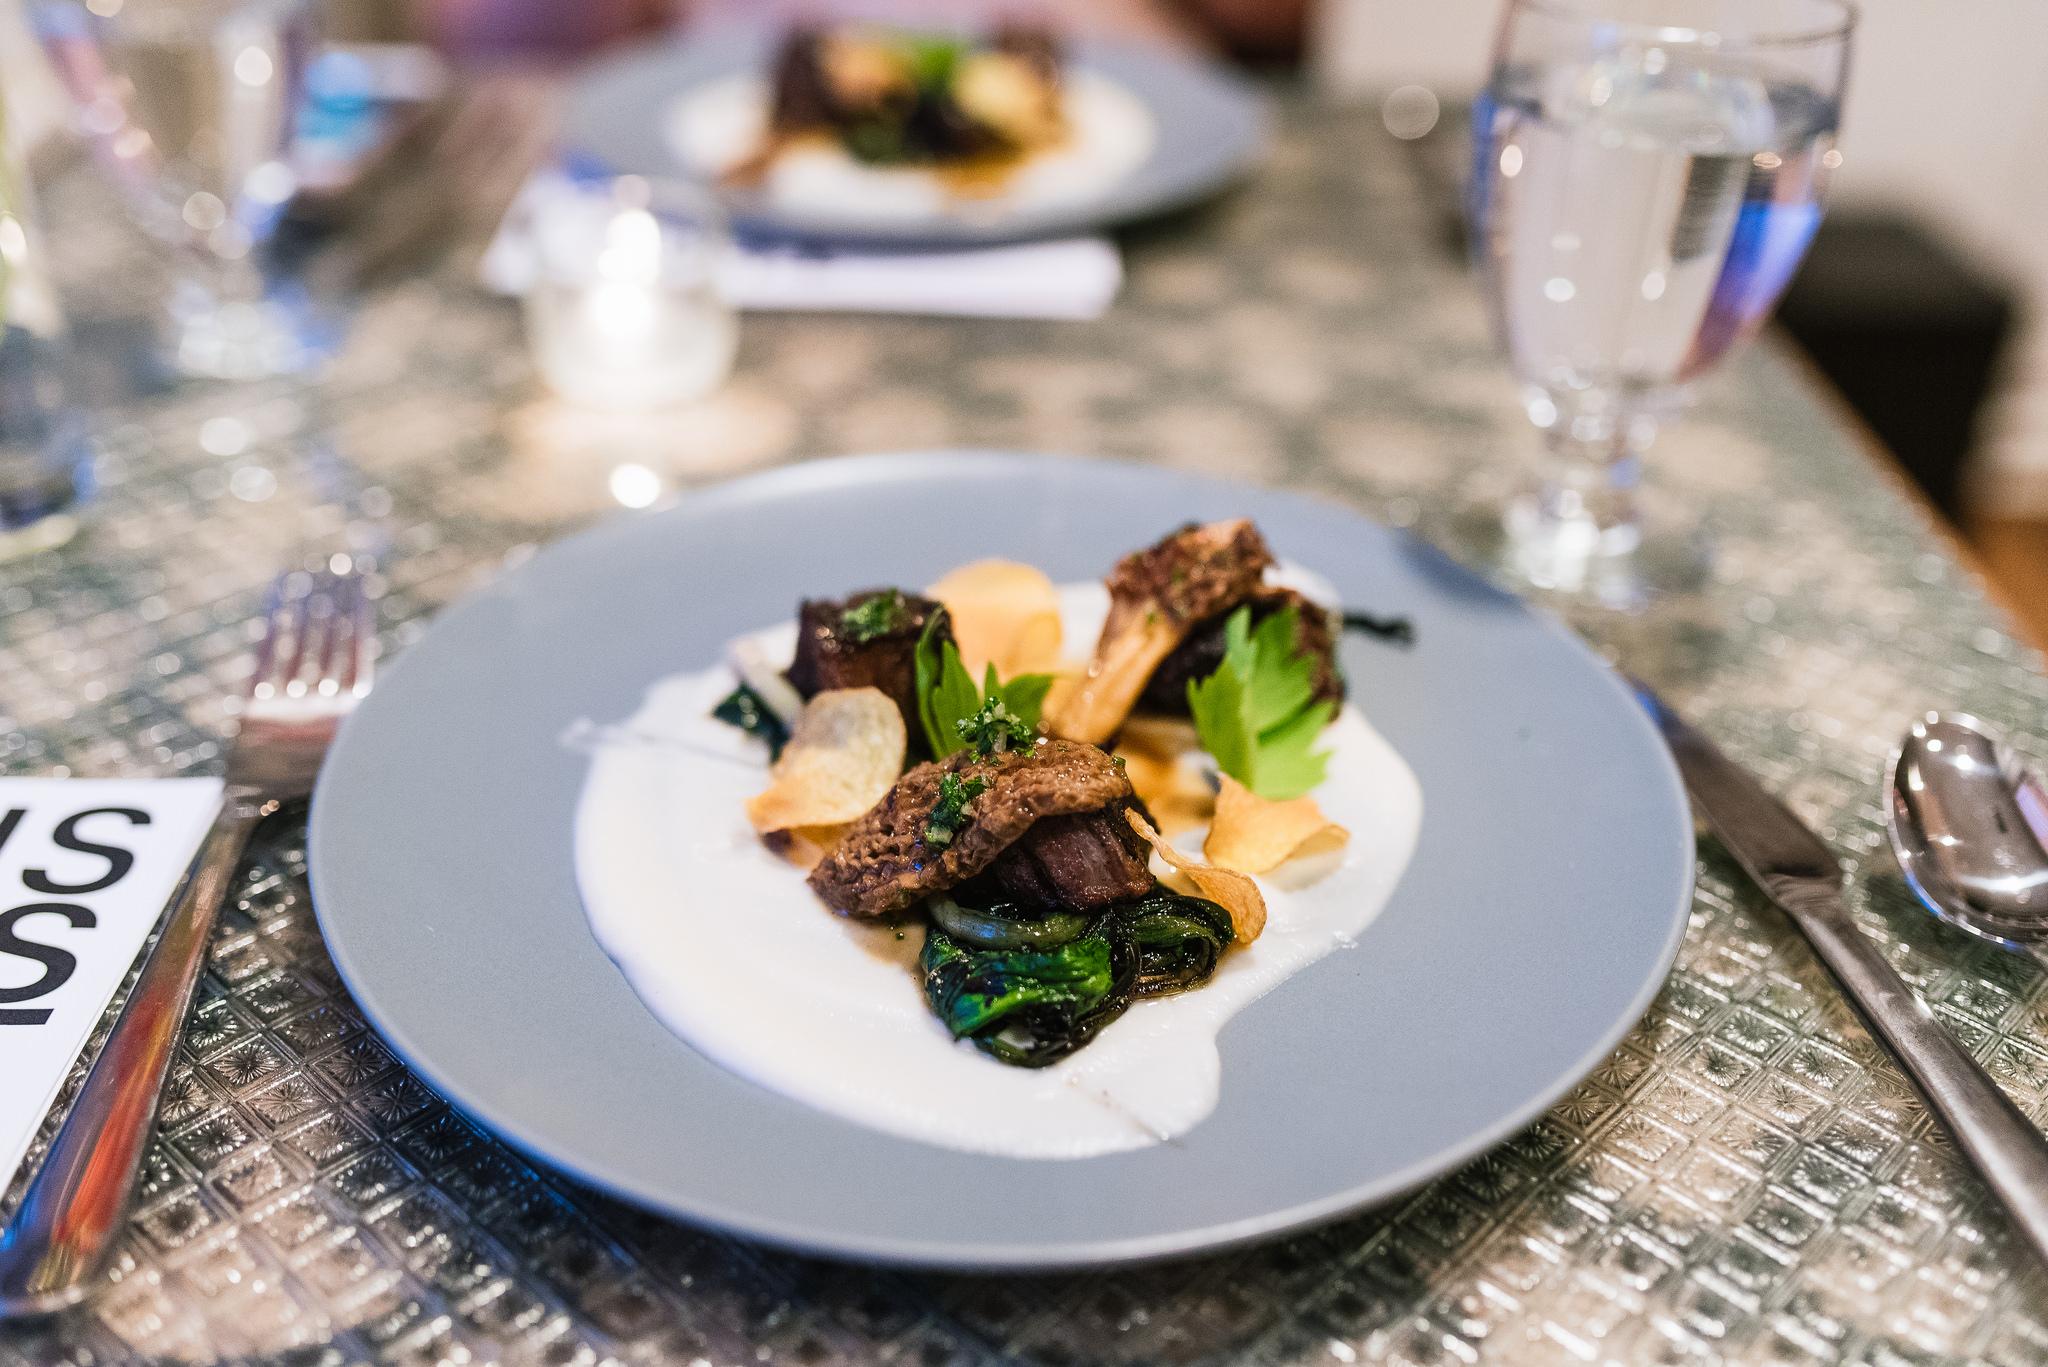 chris bolyard's beef plate